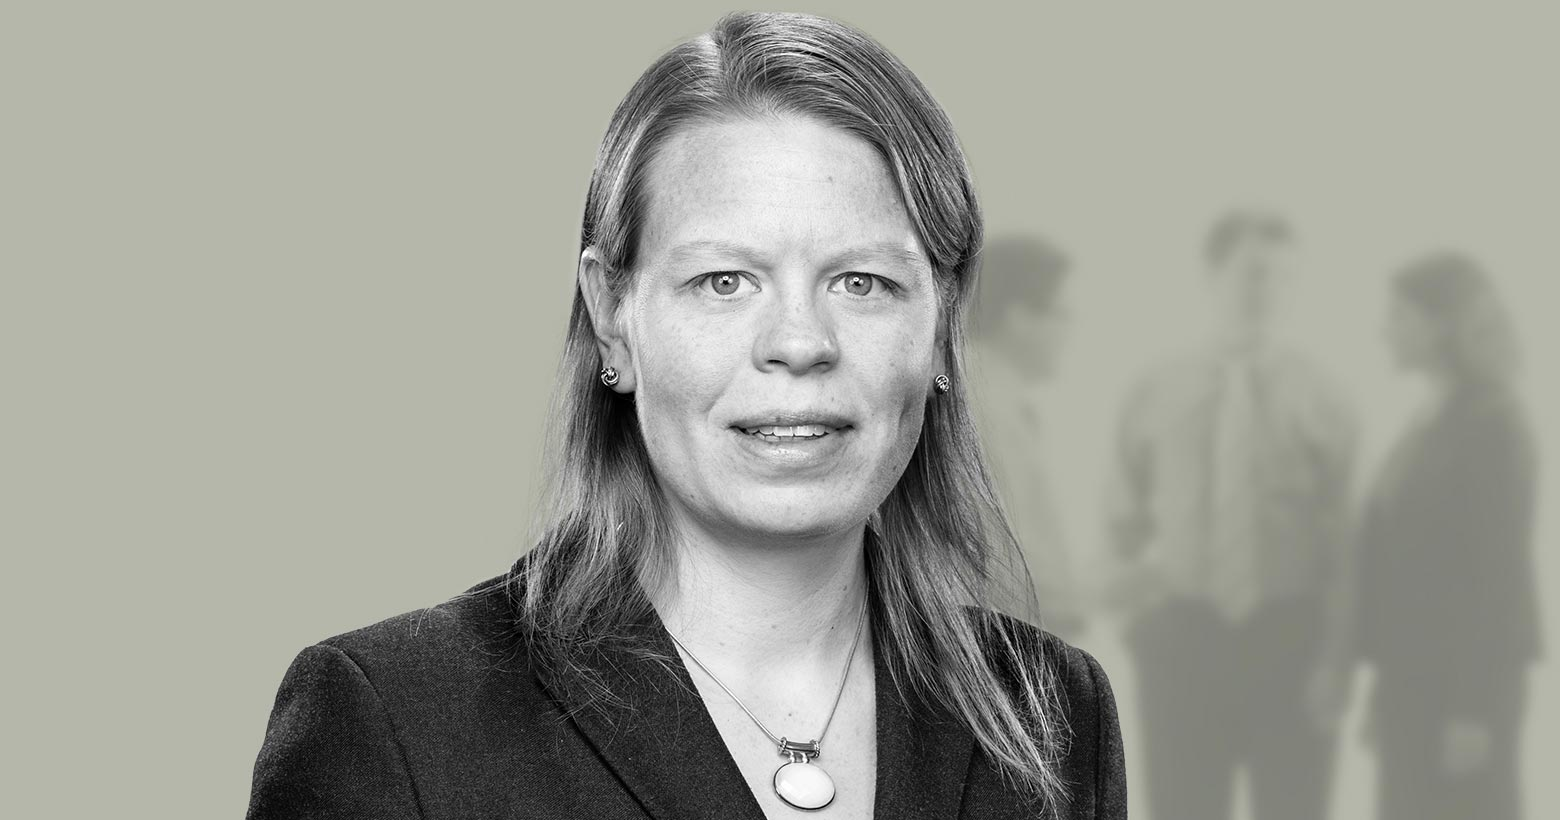 Amanda L. Weiss